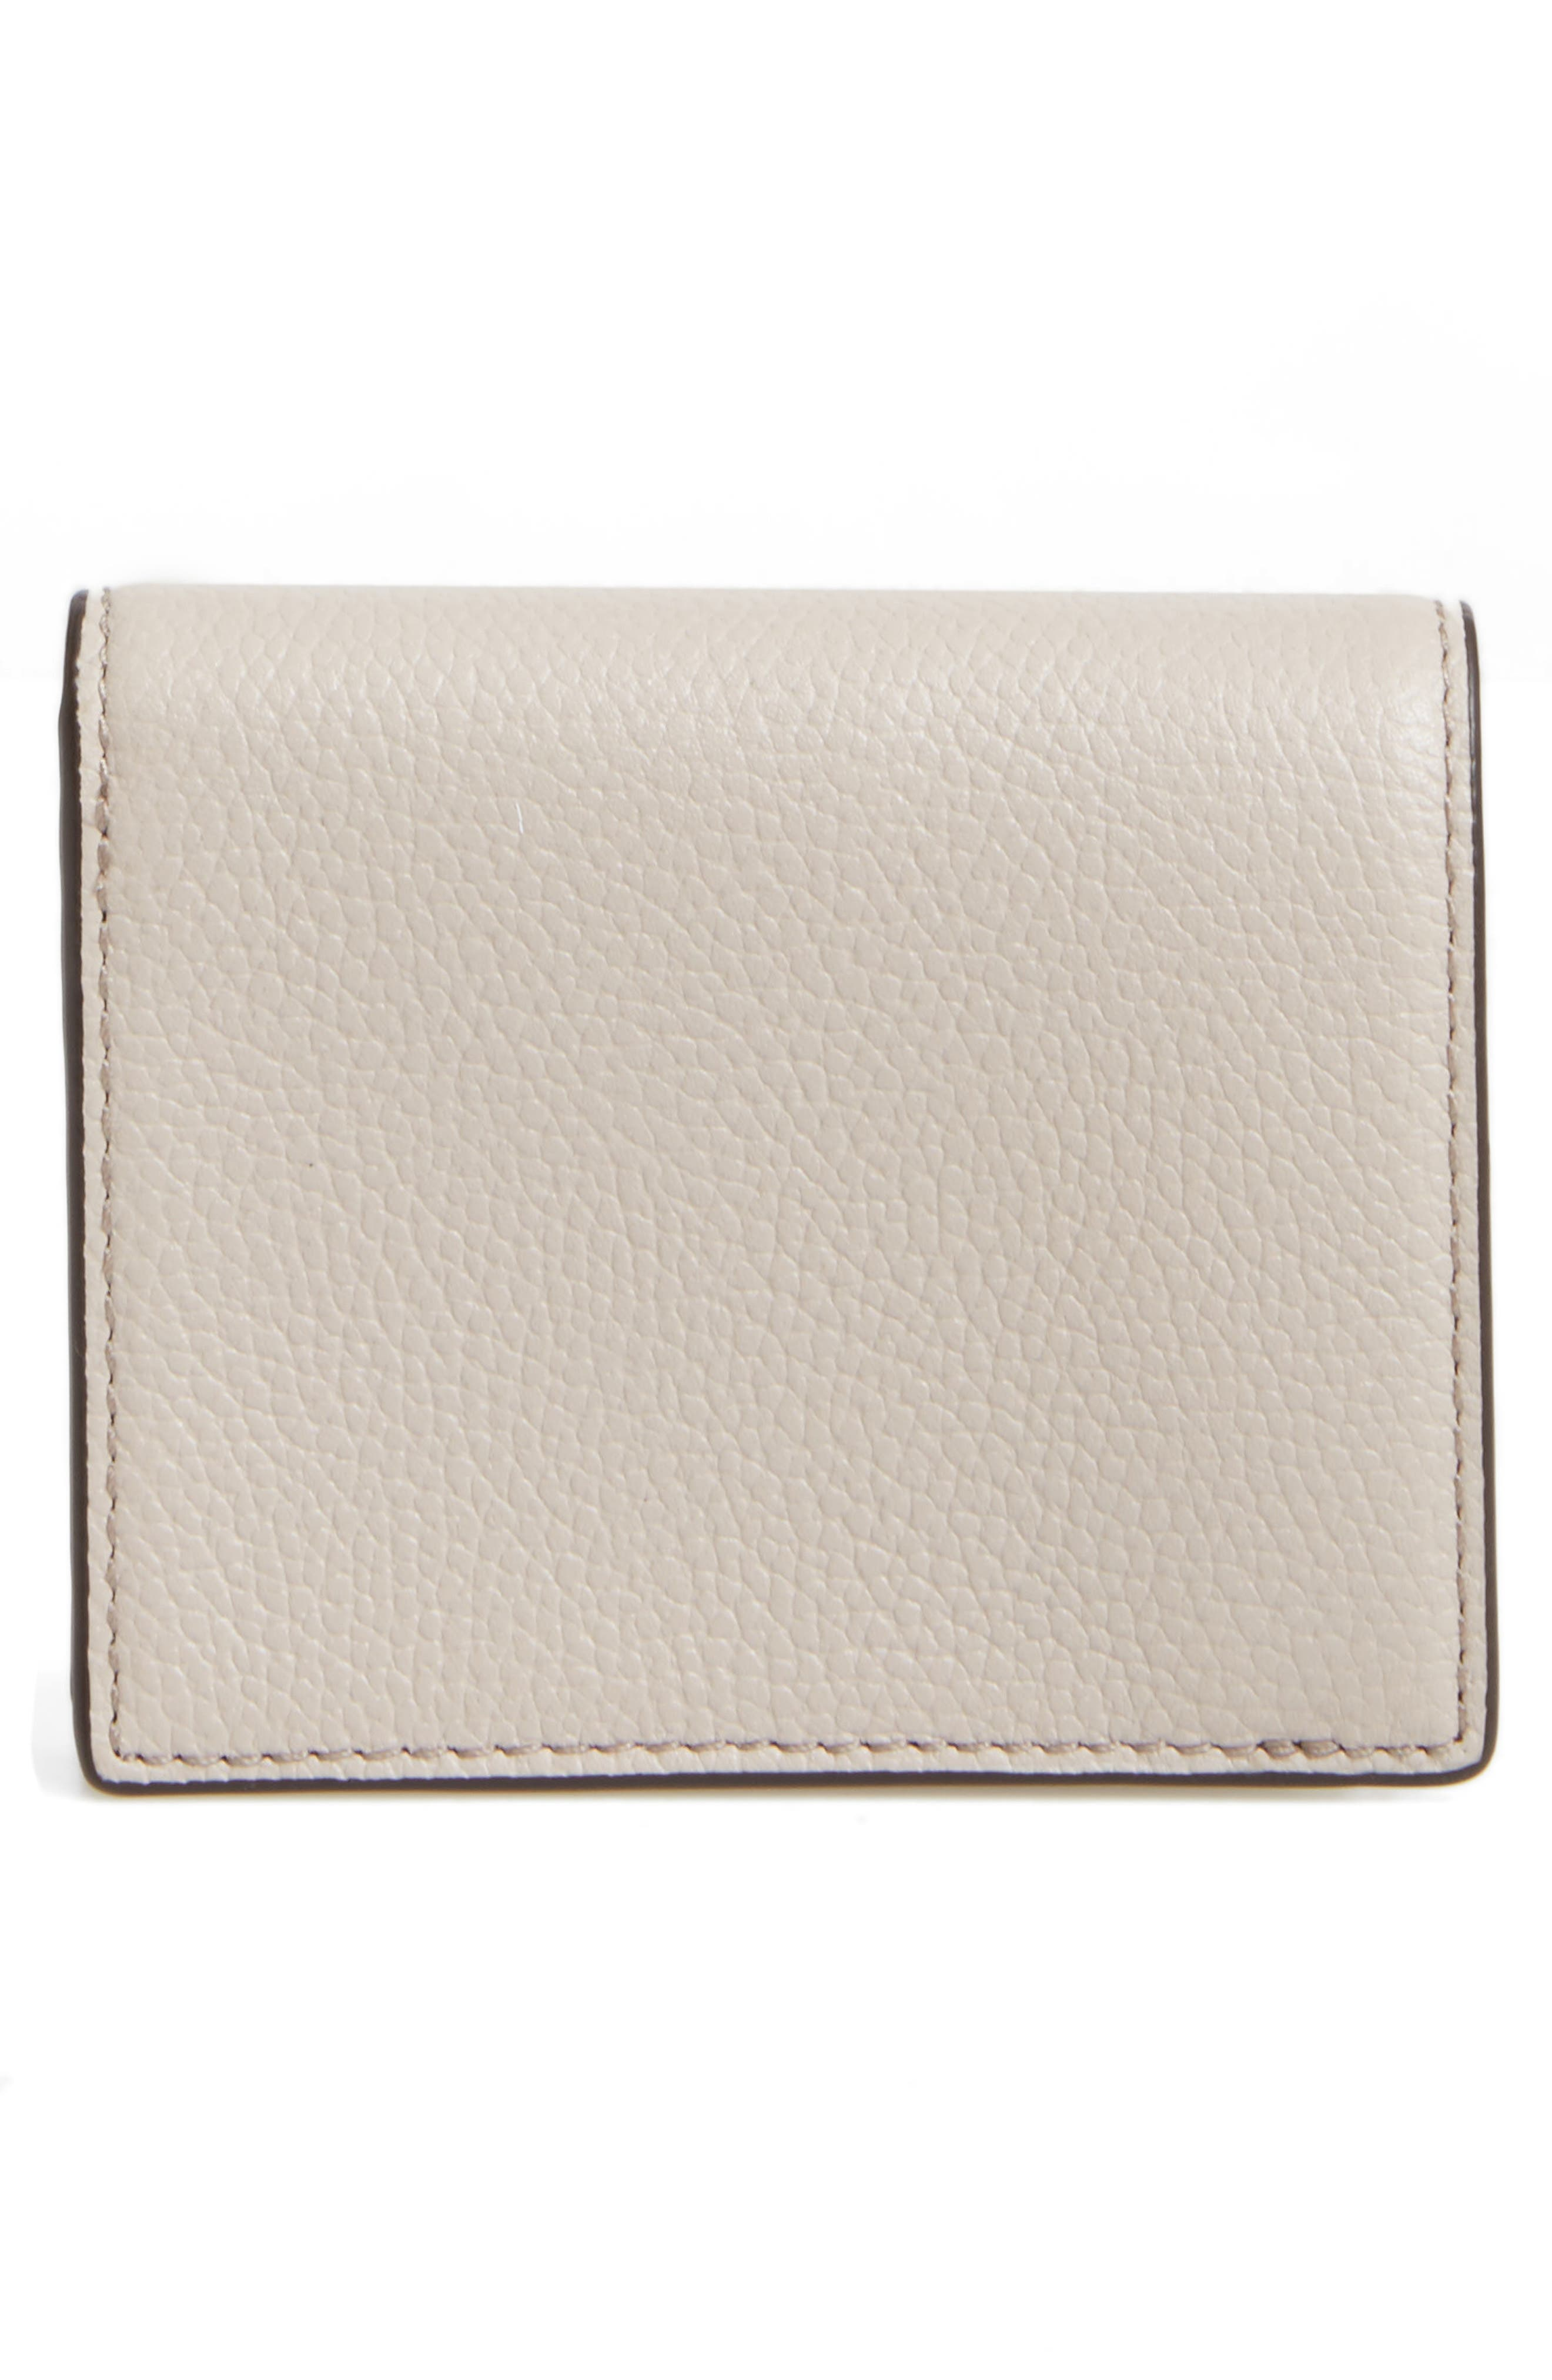 Alternate Image 2  - MICHAEL Michael Kors Mercer Leather RFID Cardholder Wallet